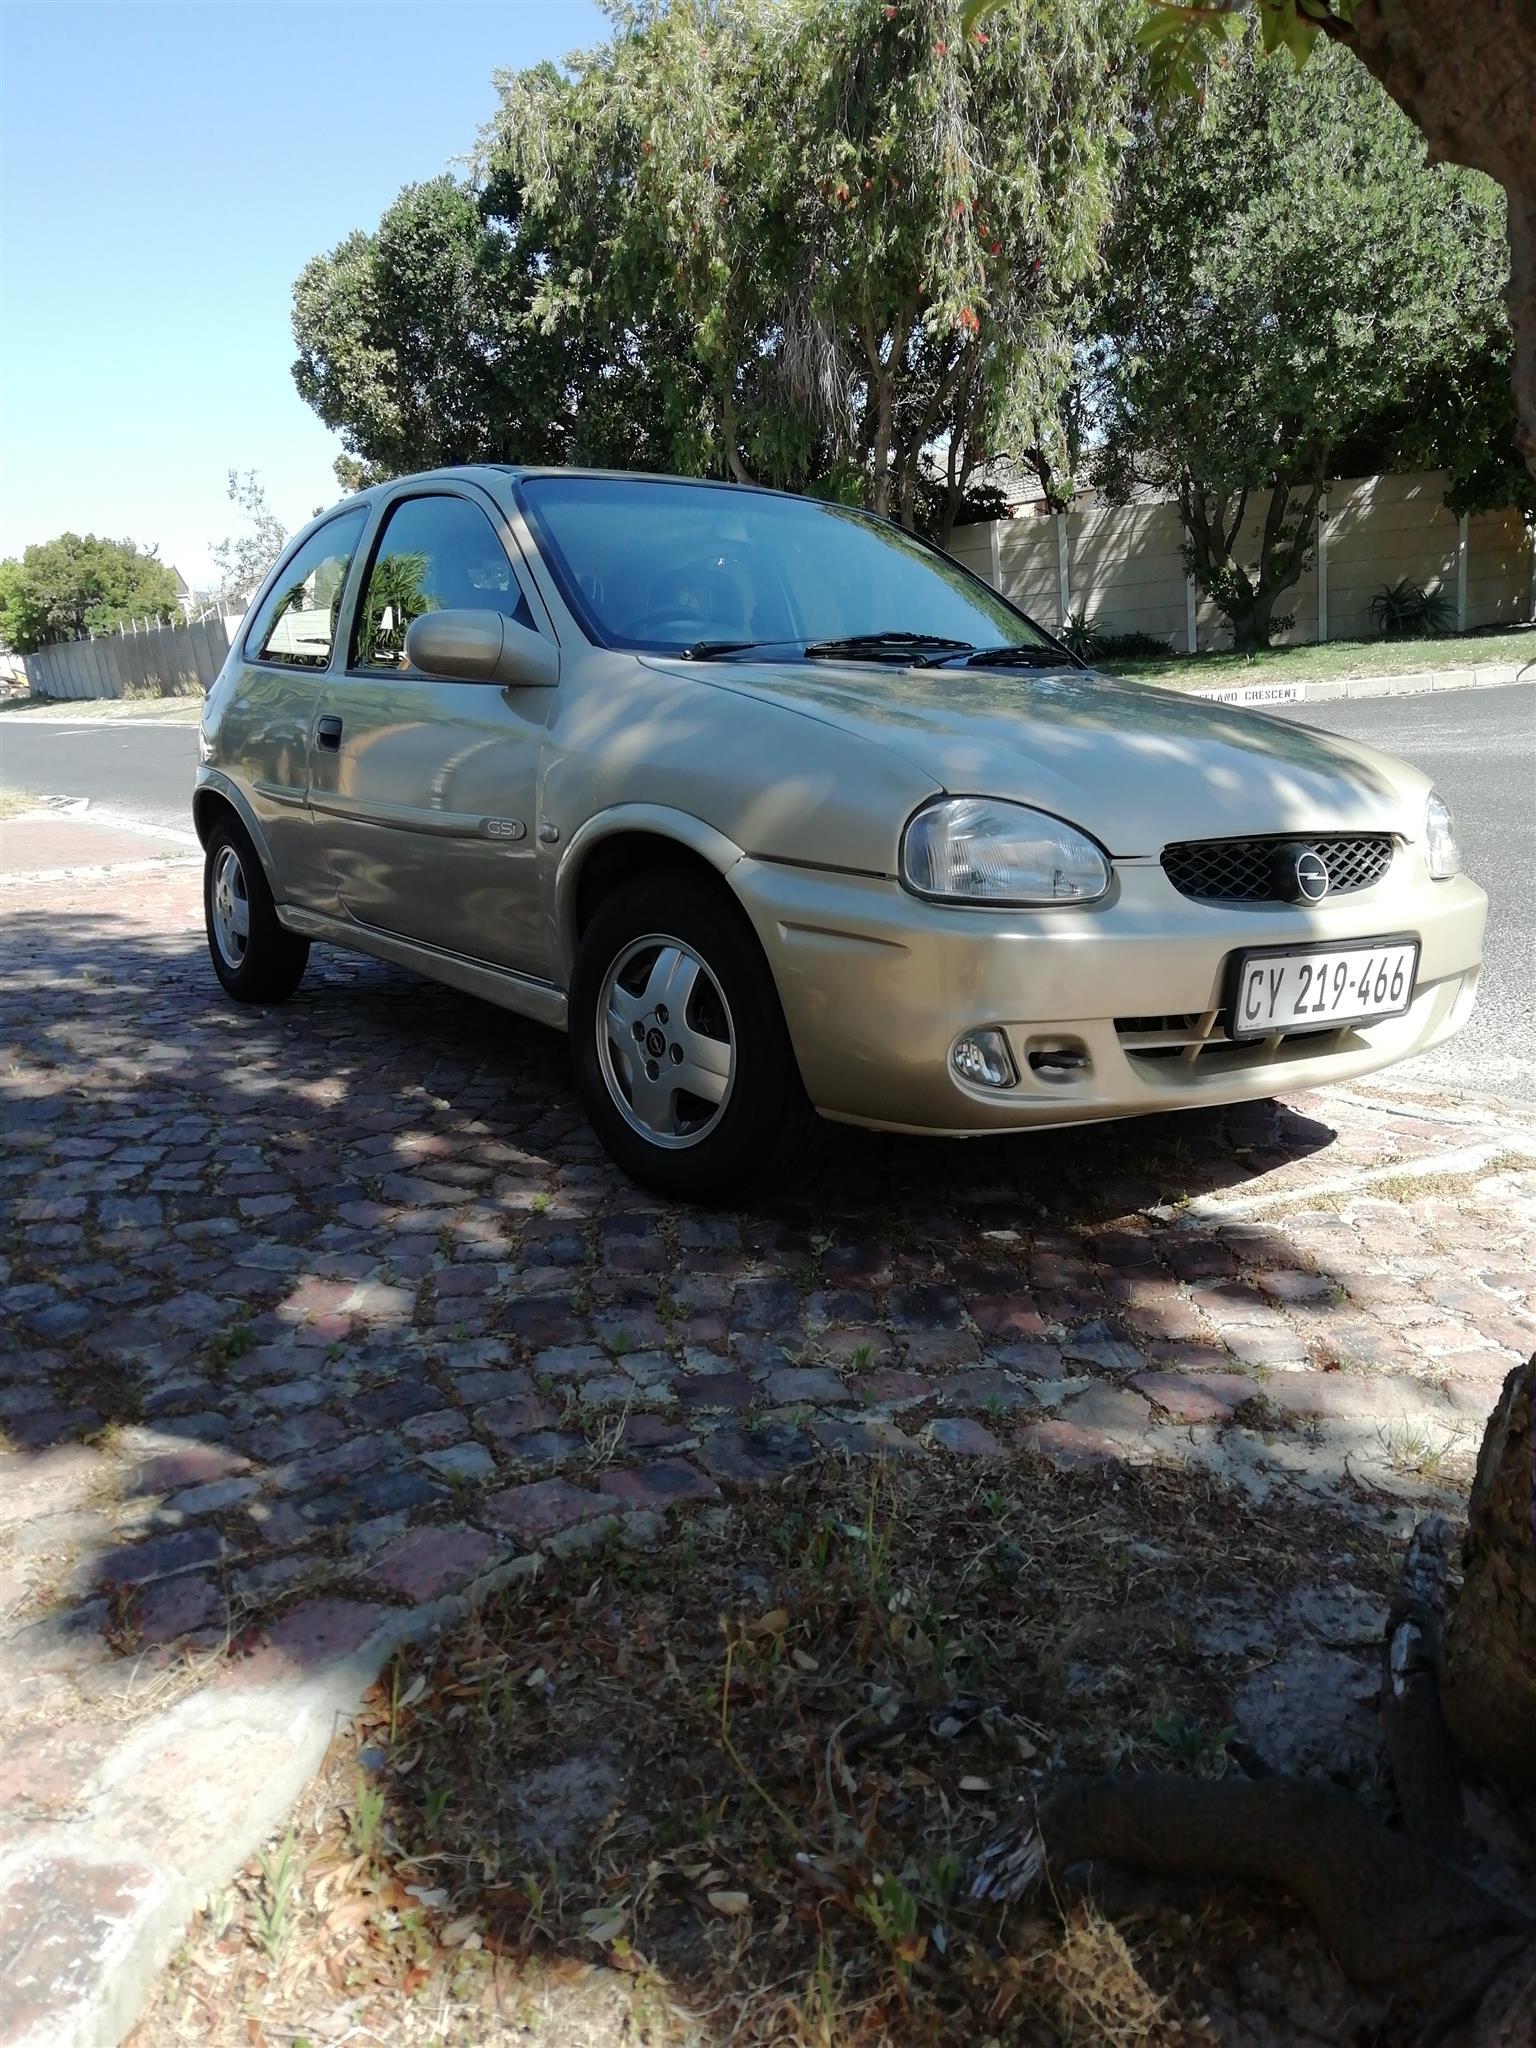 2002 Opel Corsa 1.8 GSi